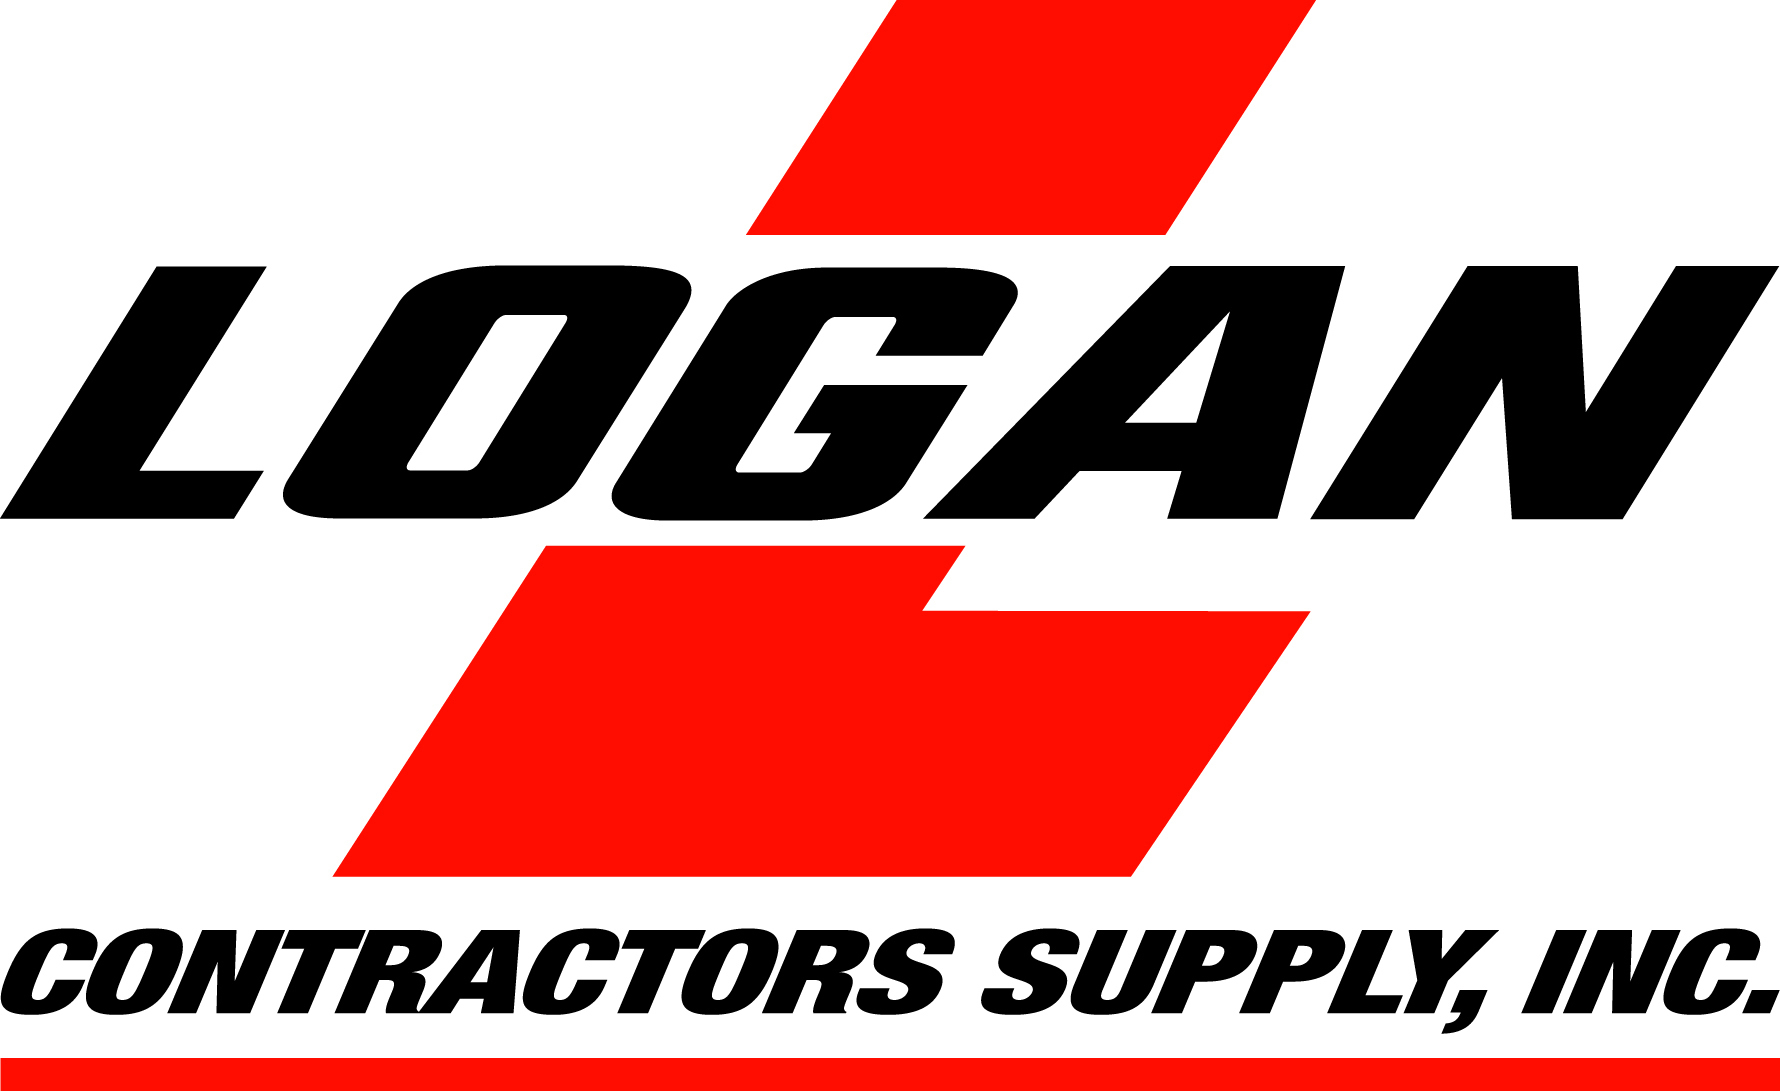 Logan Contractors Supply logo